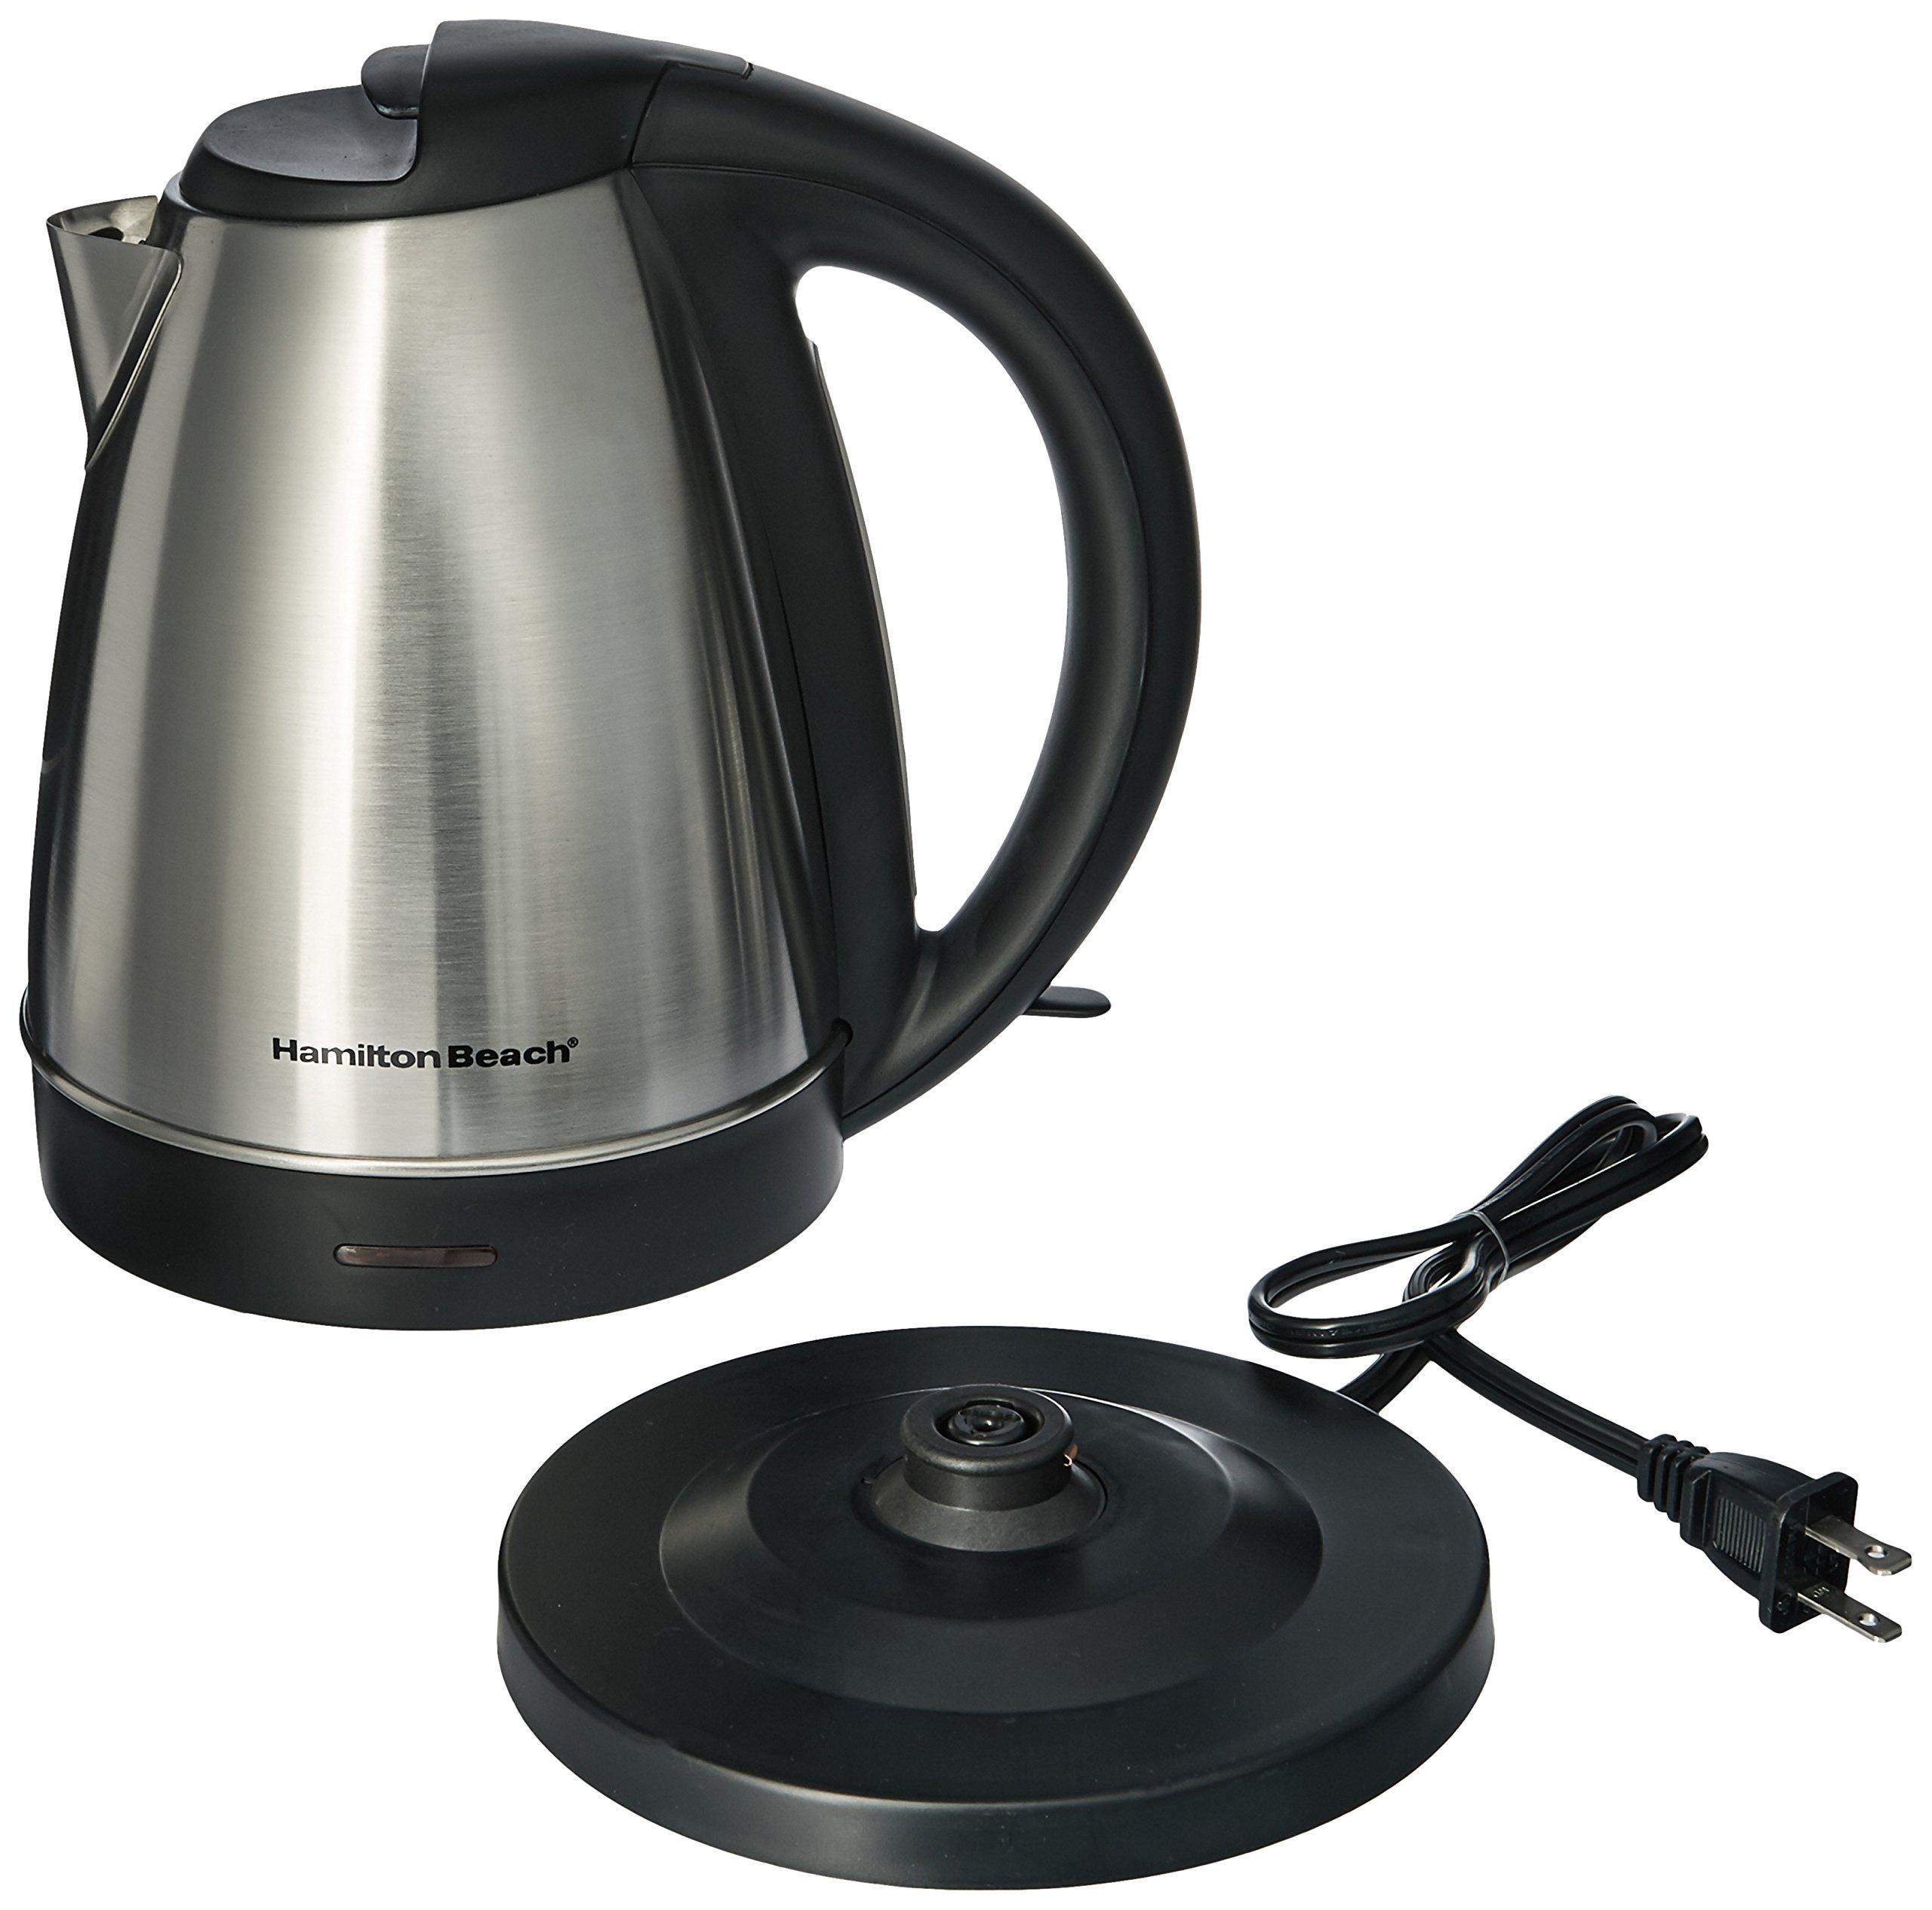 Galleon Kitchenaid Kek1222pt 1 25 Liter Electric Kettle